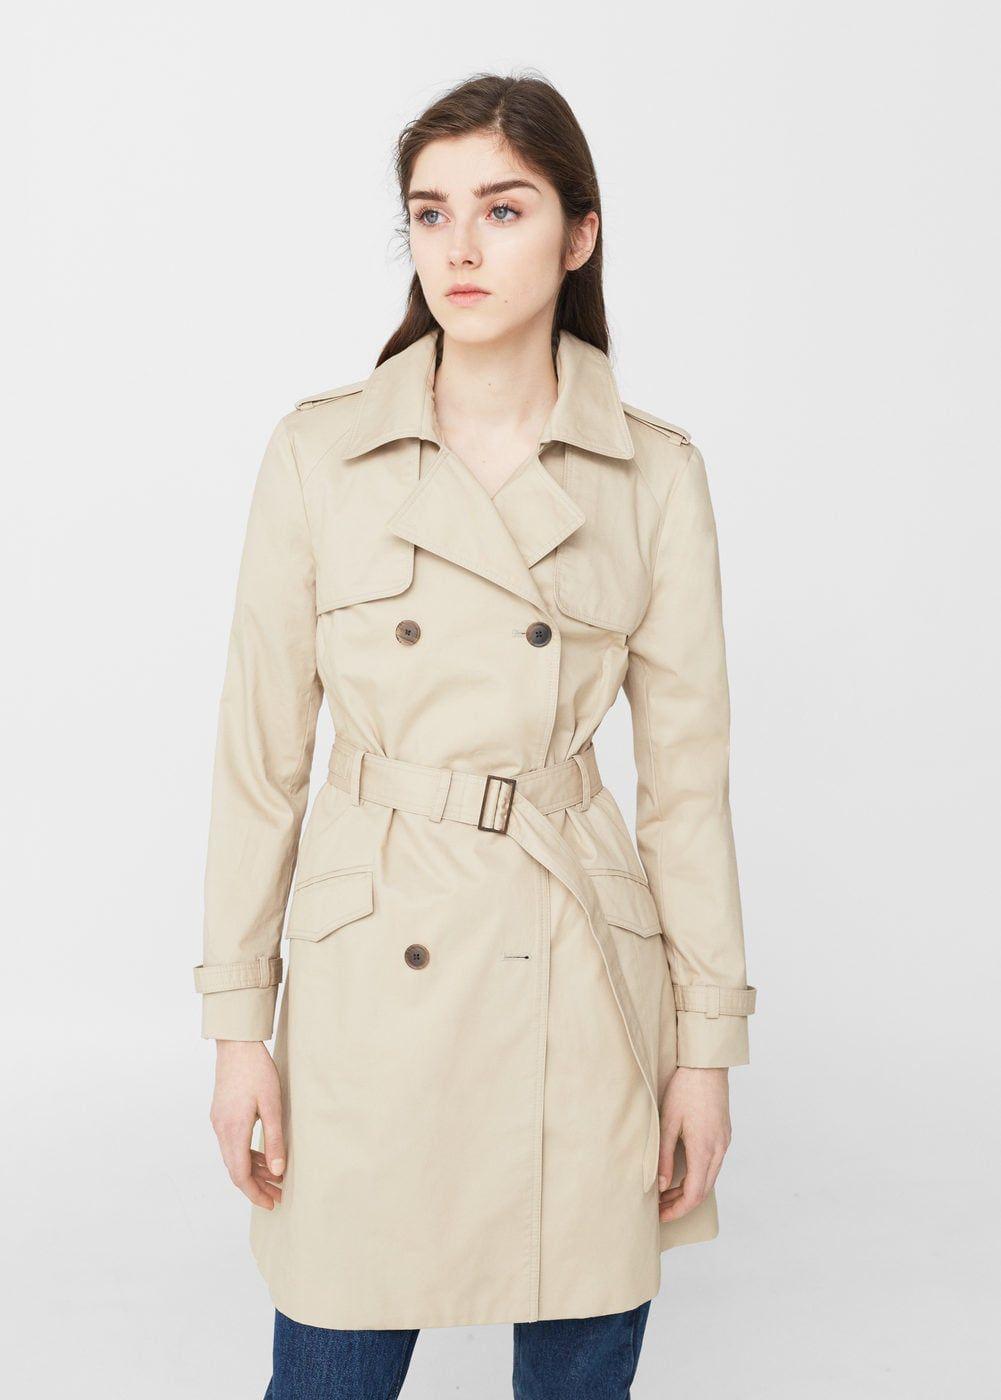 Women Classic Abrigos Pinterest trench cotton coat Clothes 0wa8wt